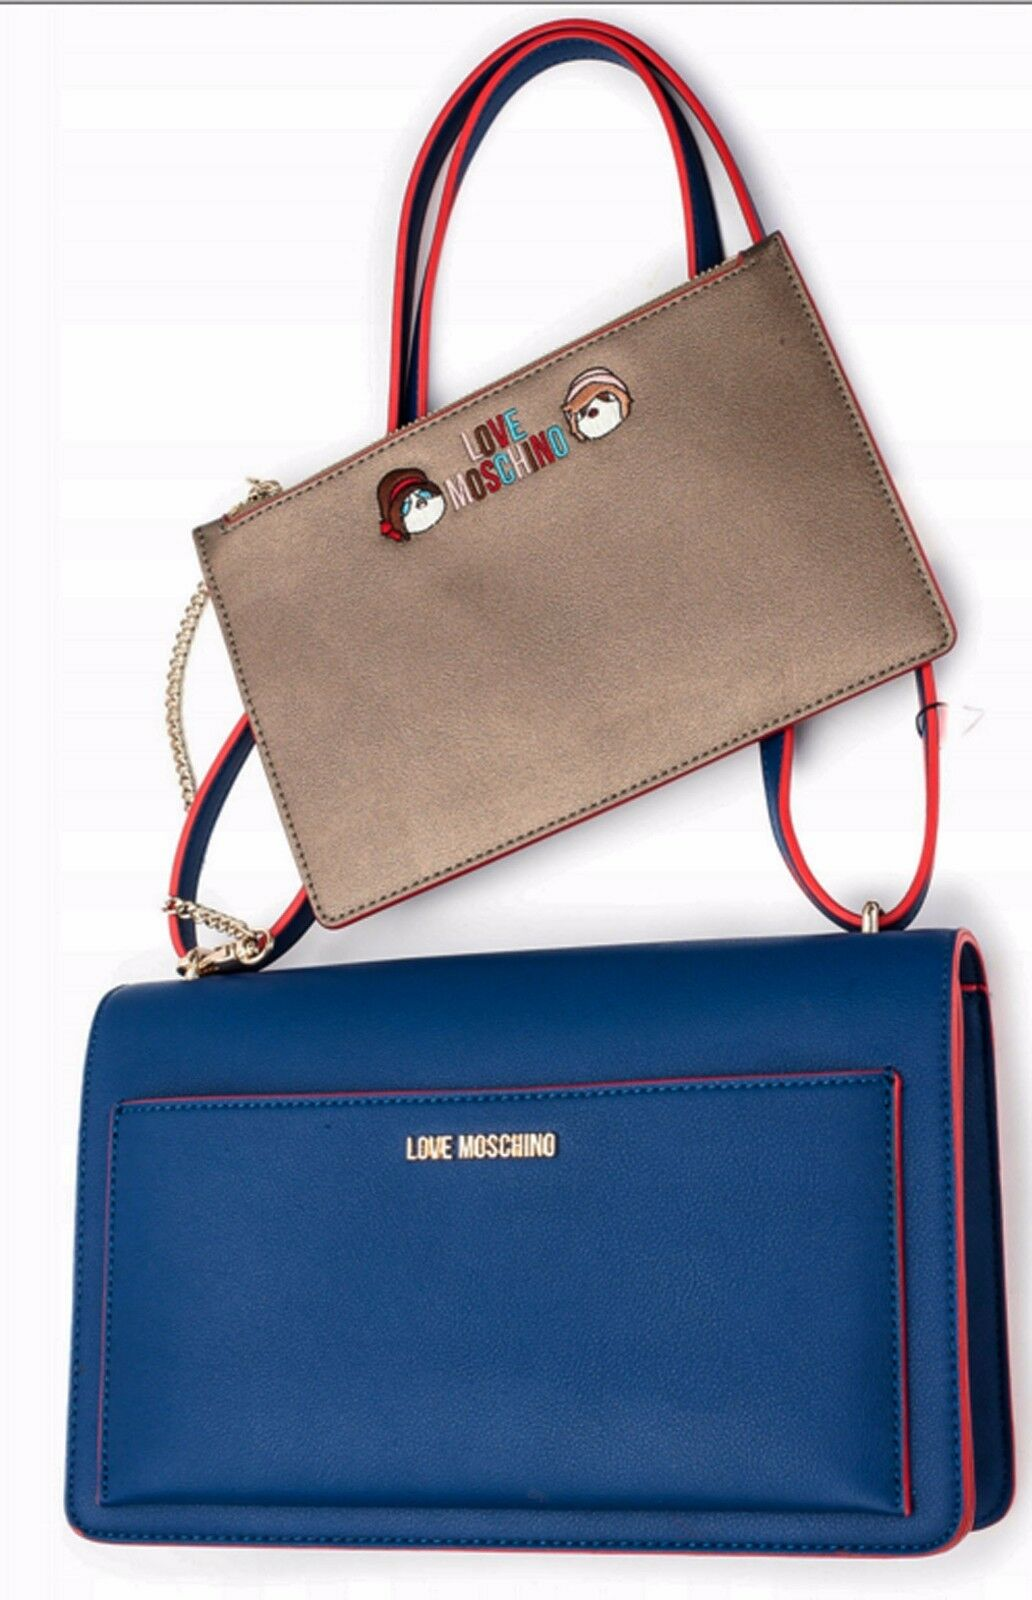 NEWT AUTH LOVE MOSCHINO BLUE RED SHOULDER BAG HANDBAG W INSIDE POUCH